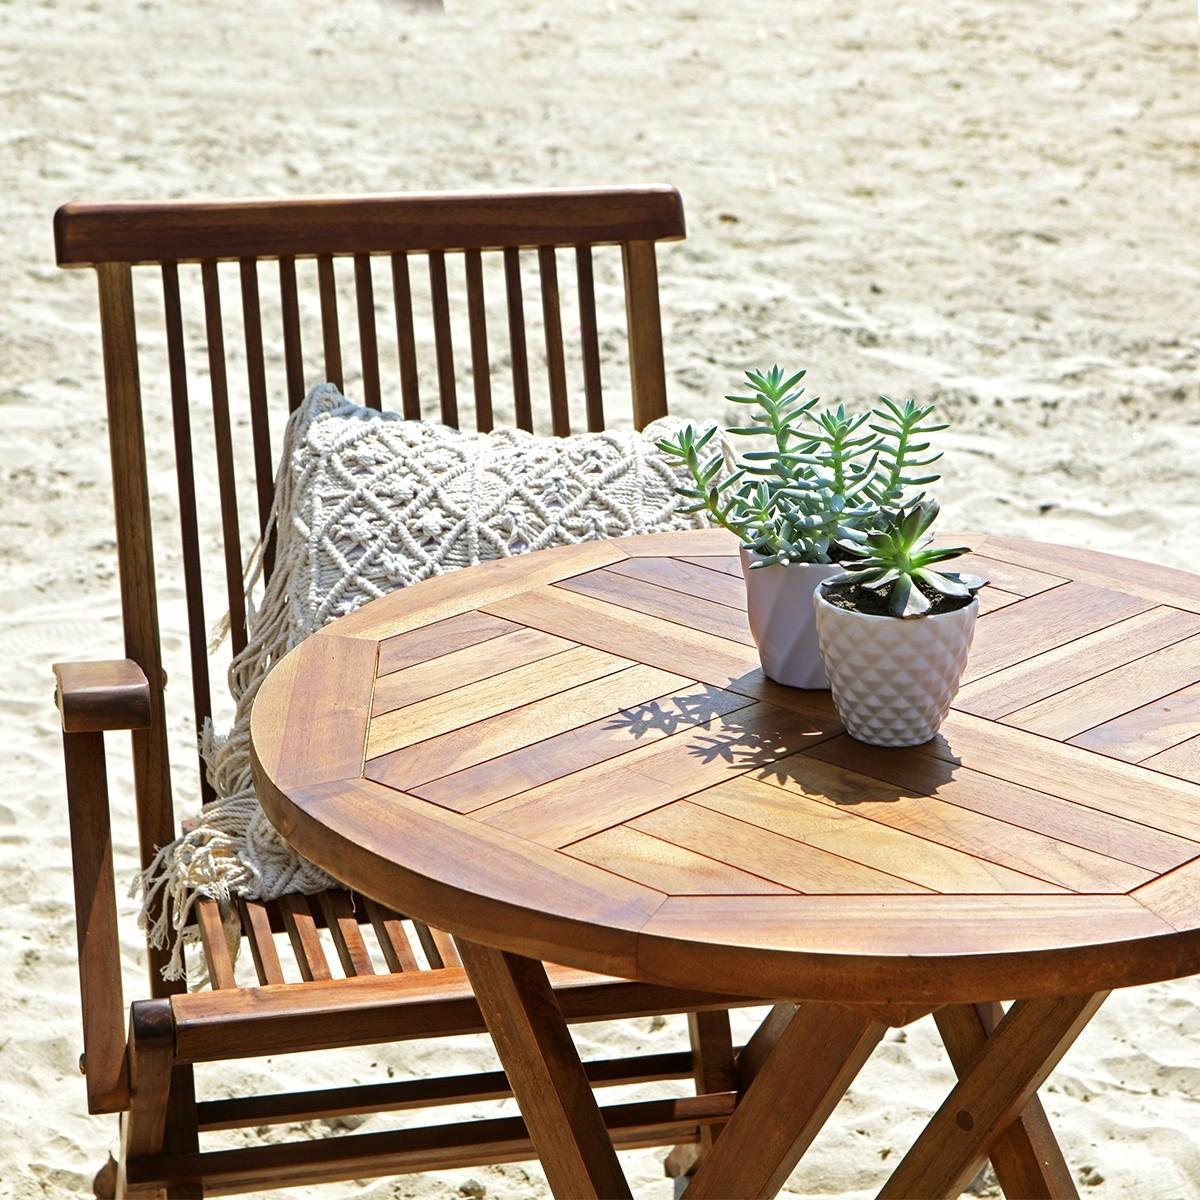 Salon de jardin en bois de teck huil bali 2 4 places bois dessus bois dessous - Salon de jardin teck huile ...